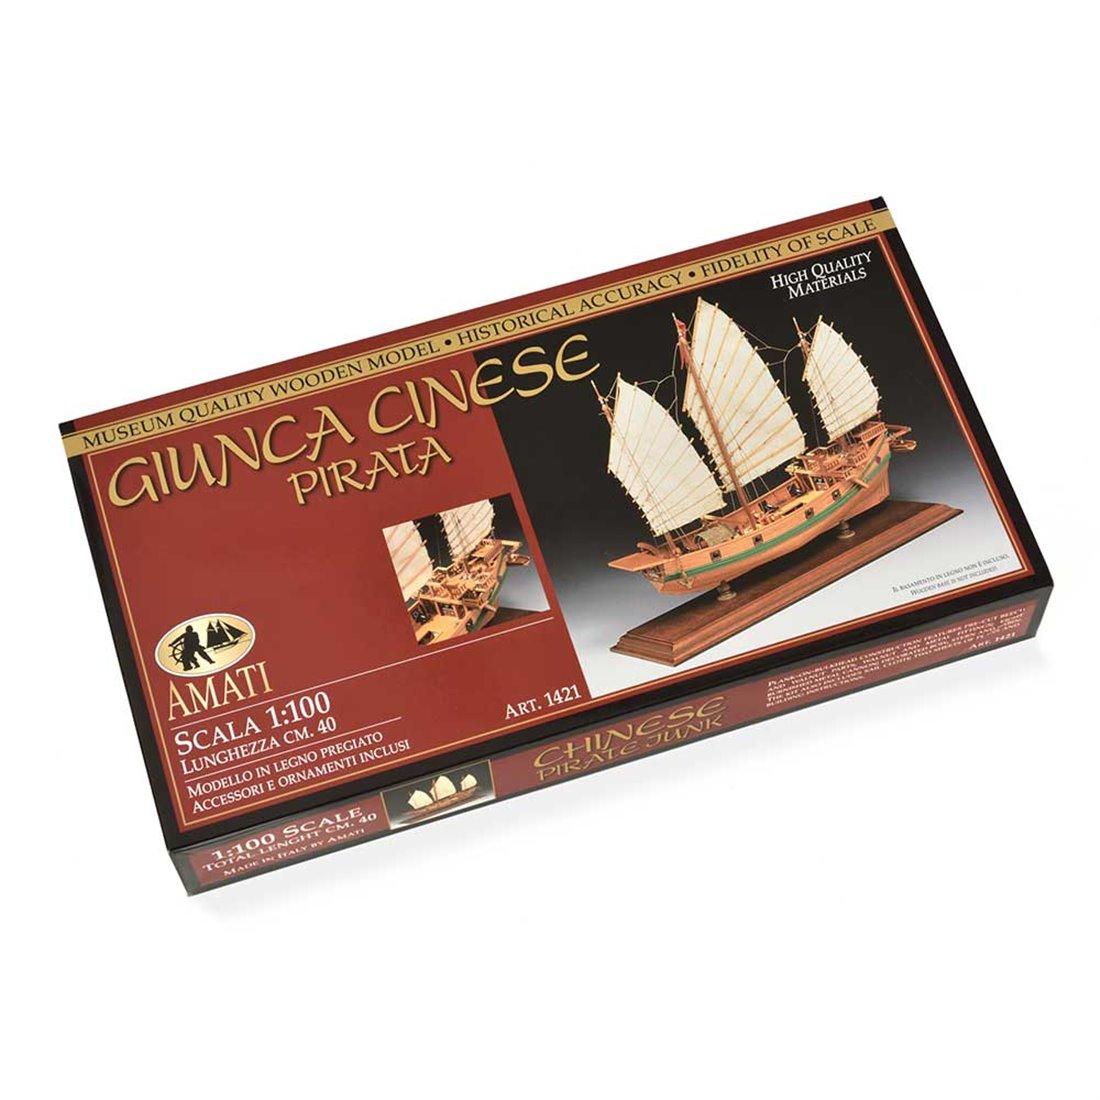 Basura pirata china